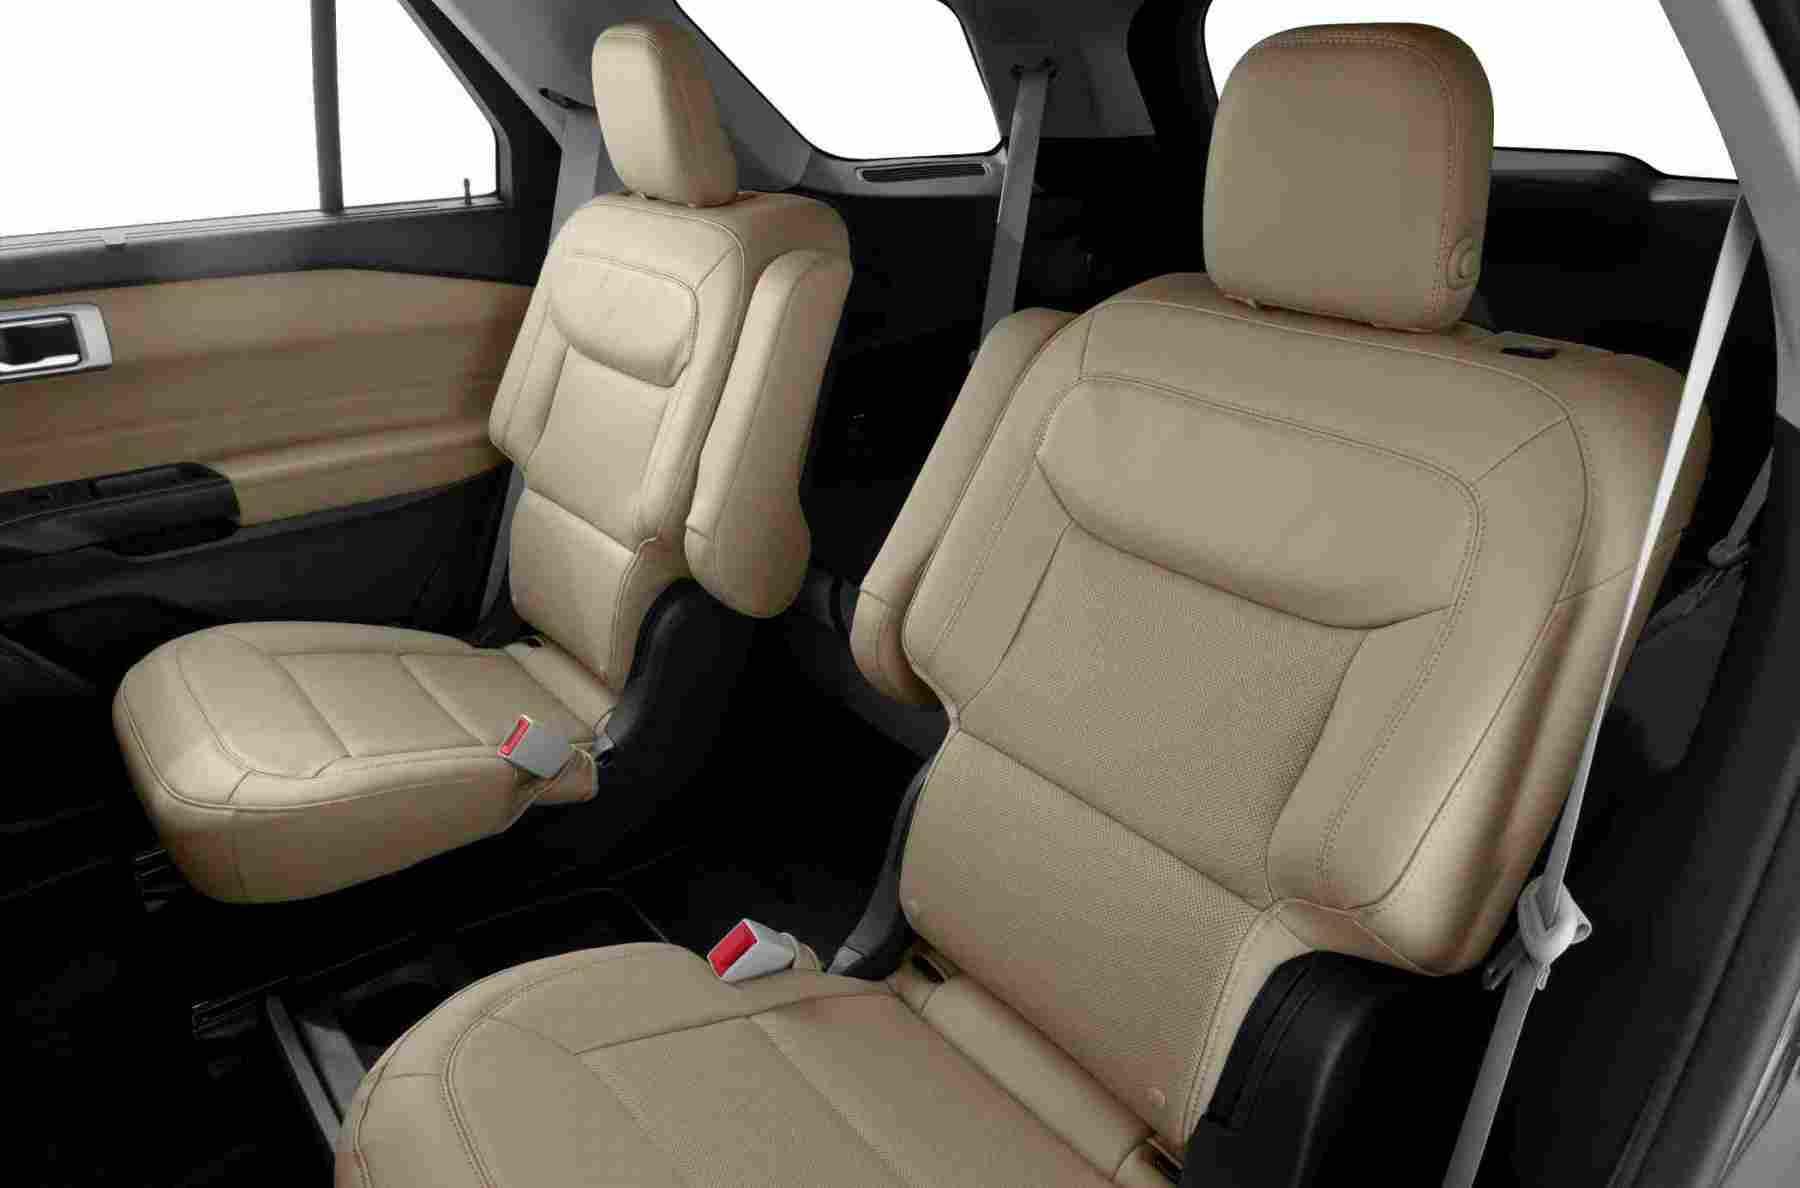 2020-ford-explorer-back-seats